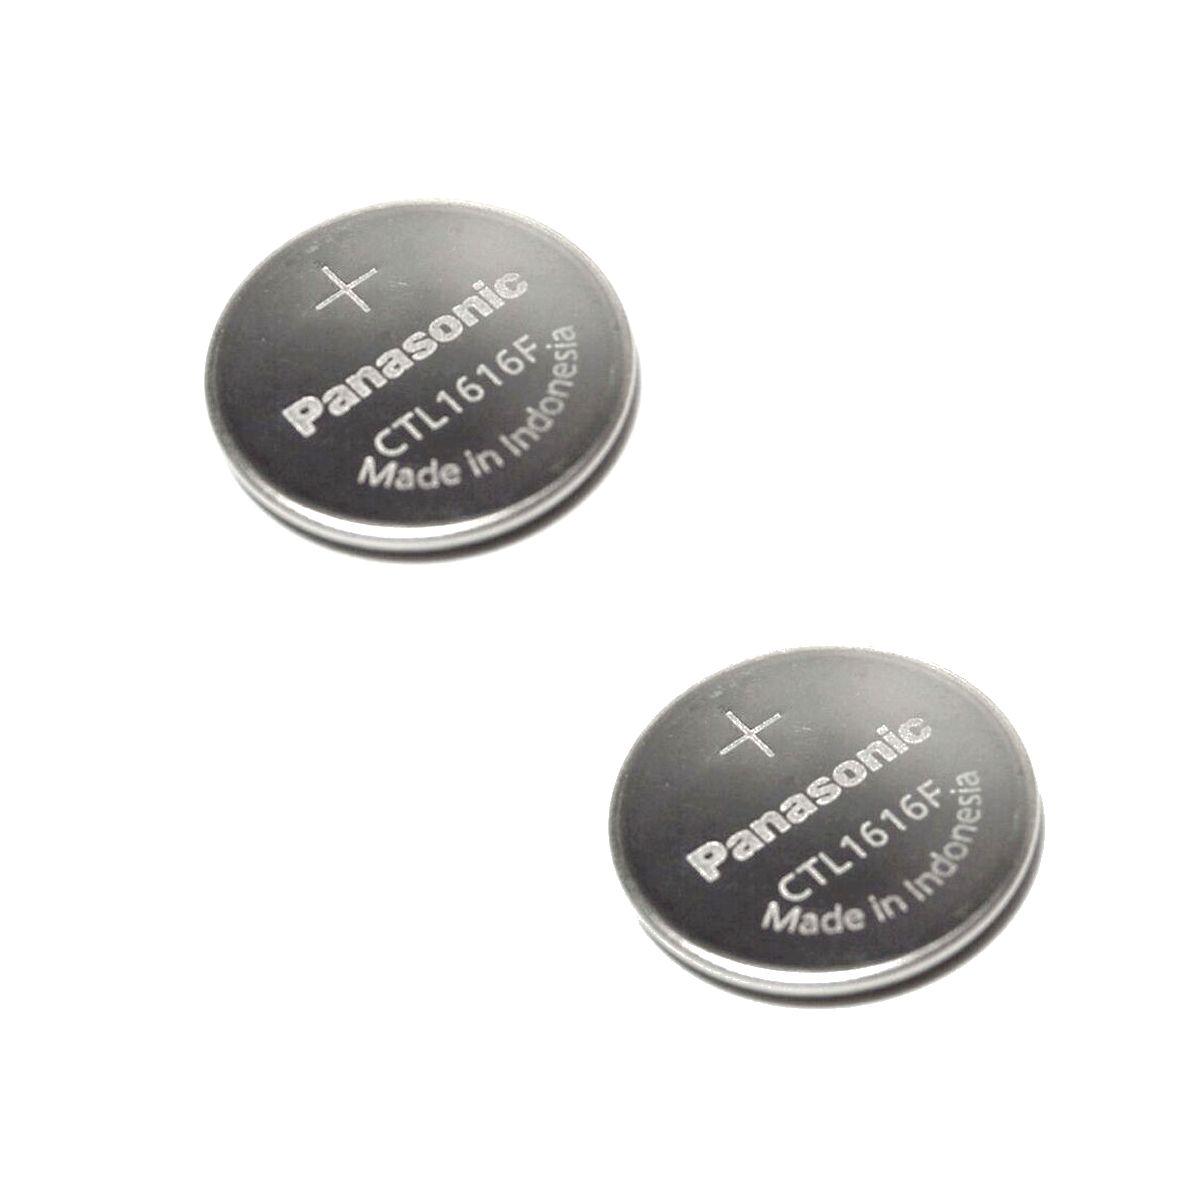 Capacitor Solar Recarregavel  CTL1616 Panasonic para Relogio Casio (2 unidades)  - E-Presentes